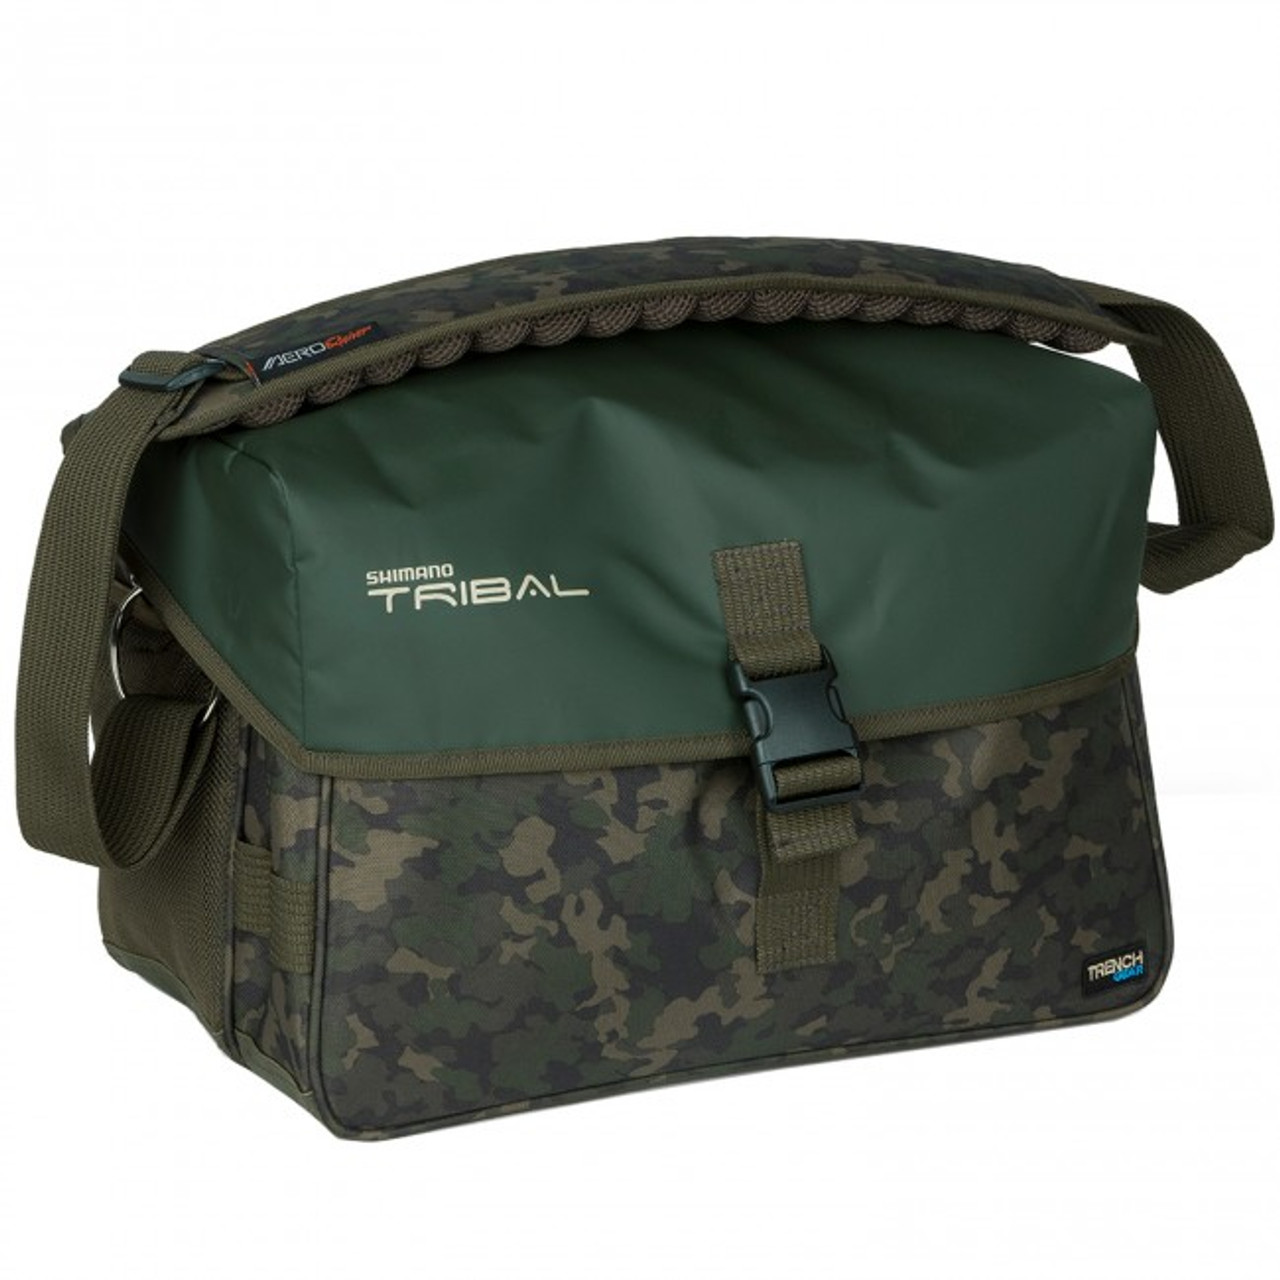 Shimano Trench Stalker Bag